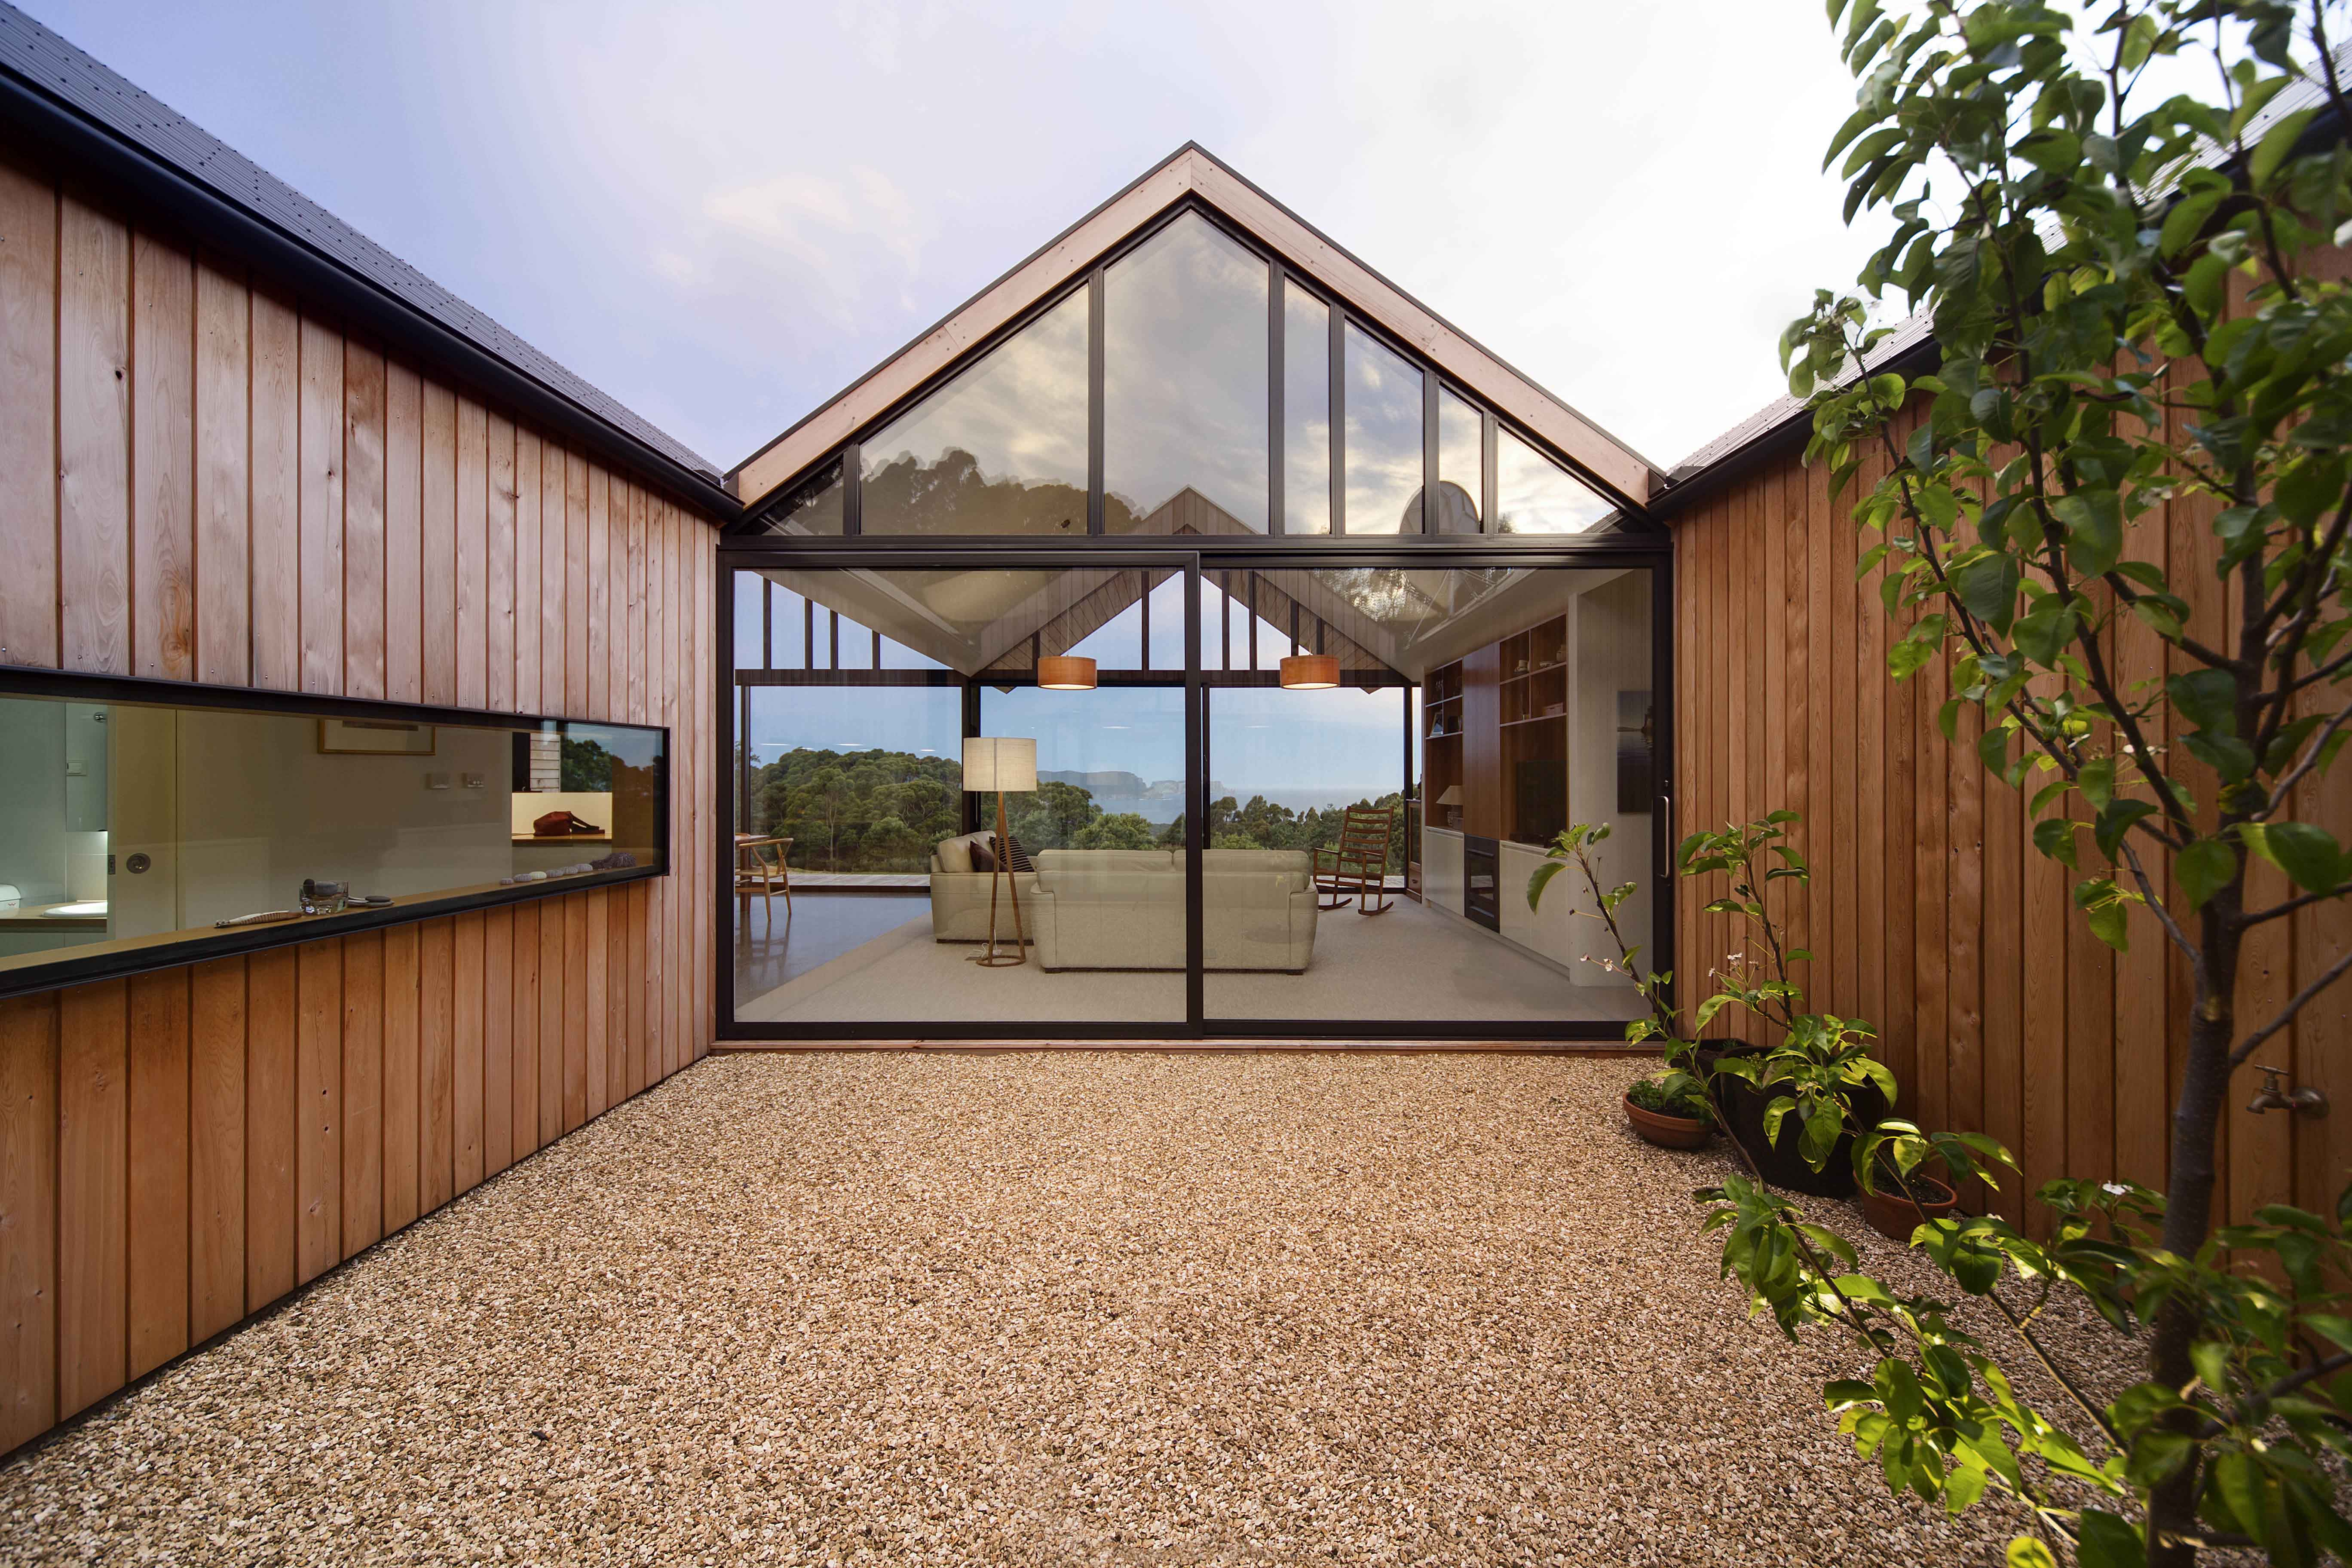 Lookout House Courtyard in Tasmania